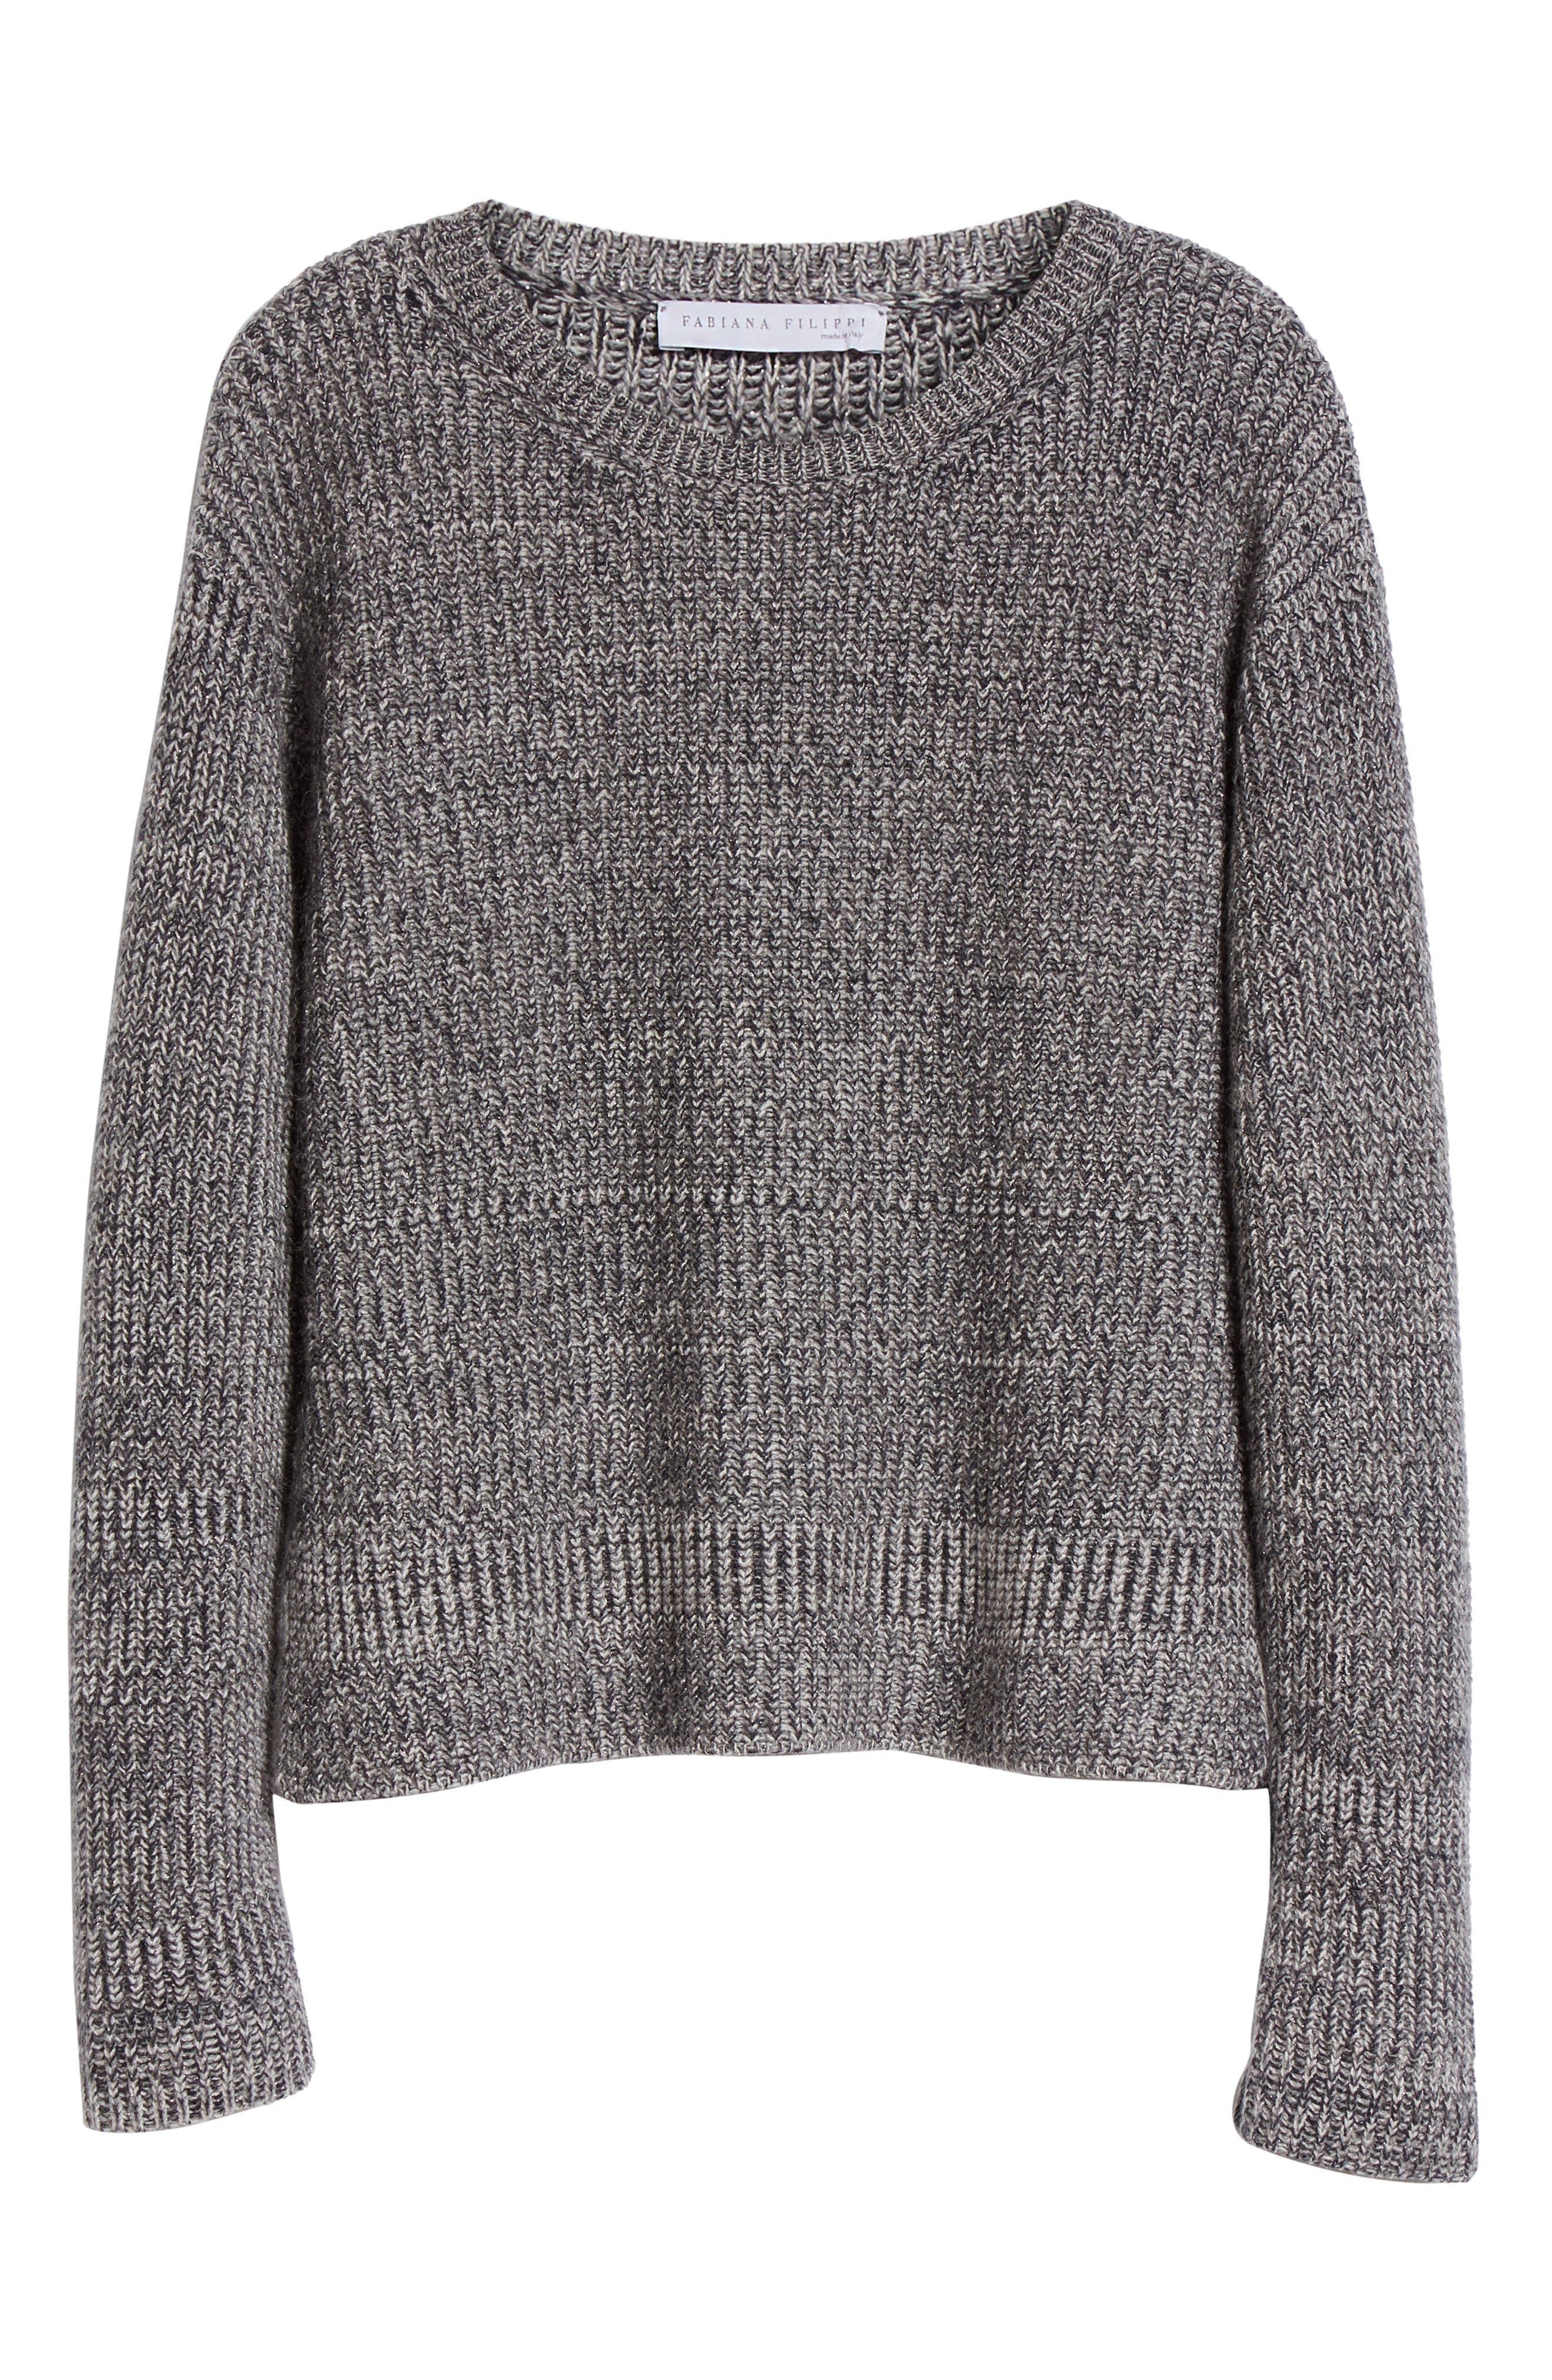 Herringbone Stitch Wool Blend Sweater,                             Alternate thumbnail 4, color,                             Grey Multi